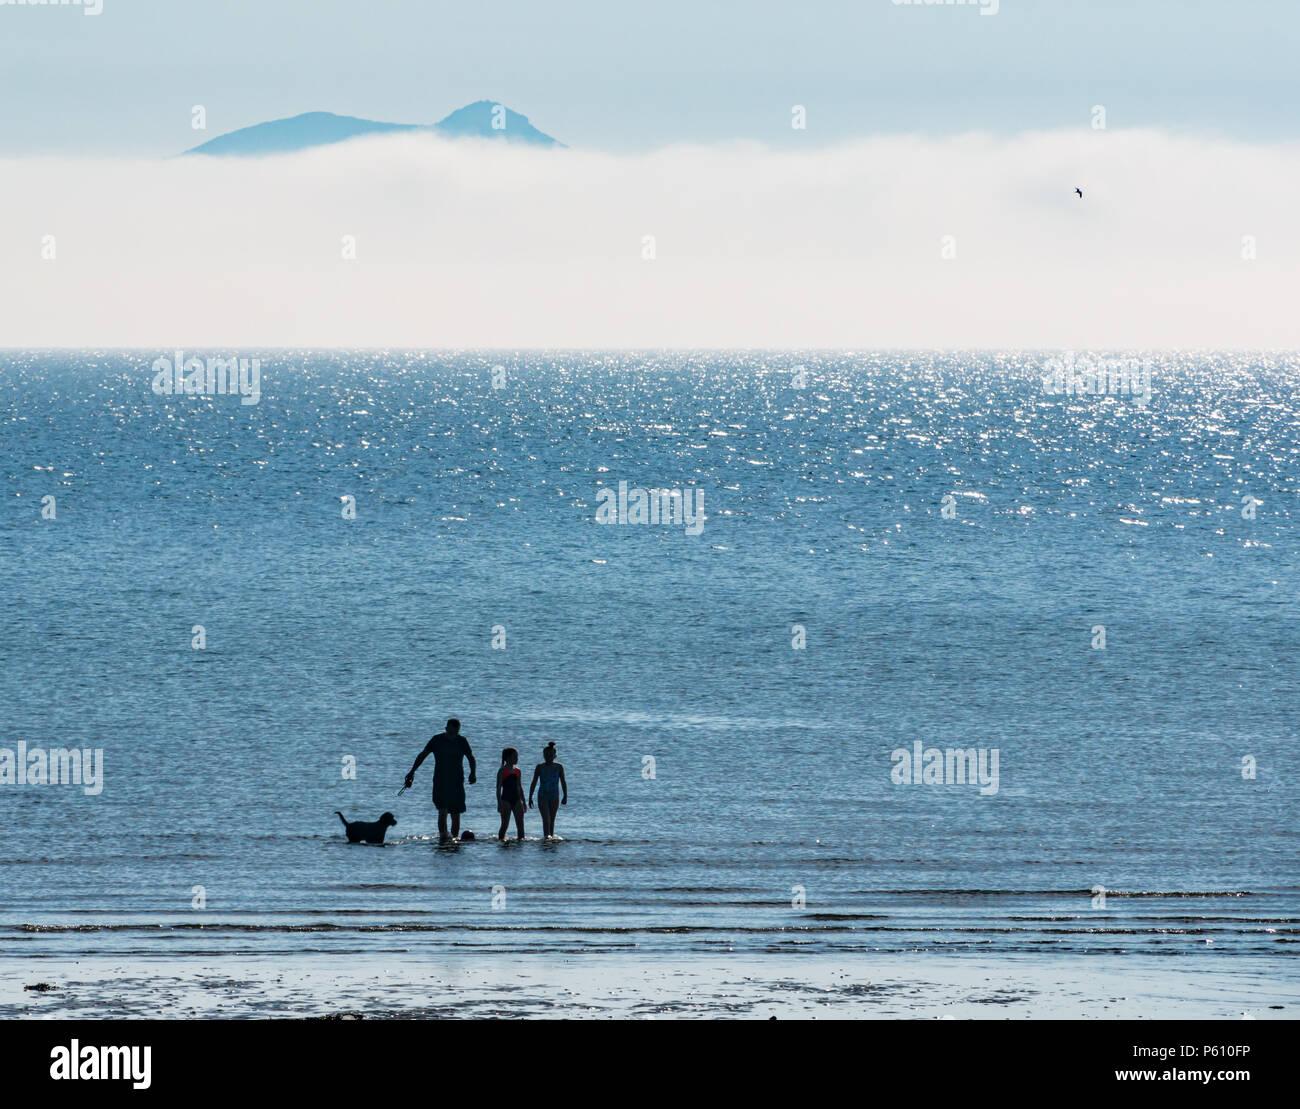 east-lothian-scotland-united-kingdom-27t